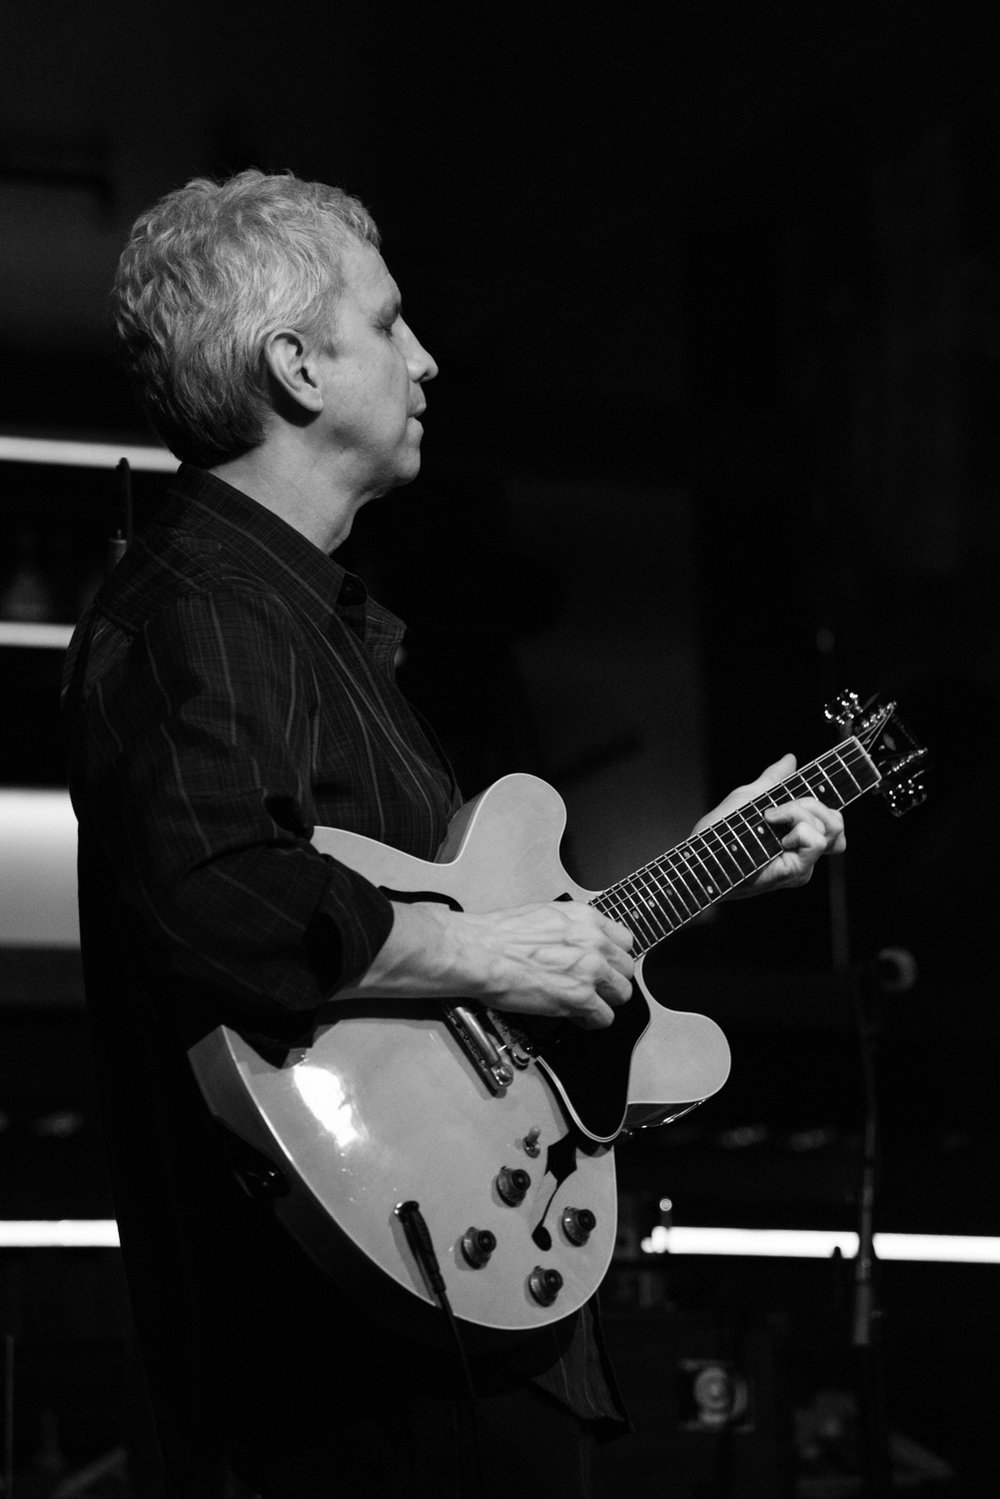 Steve Cardenas, 2016